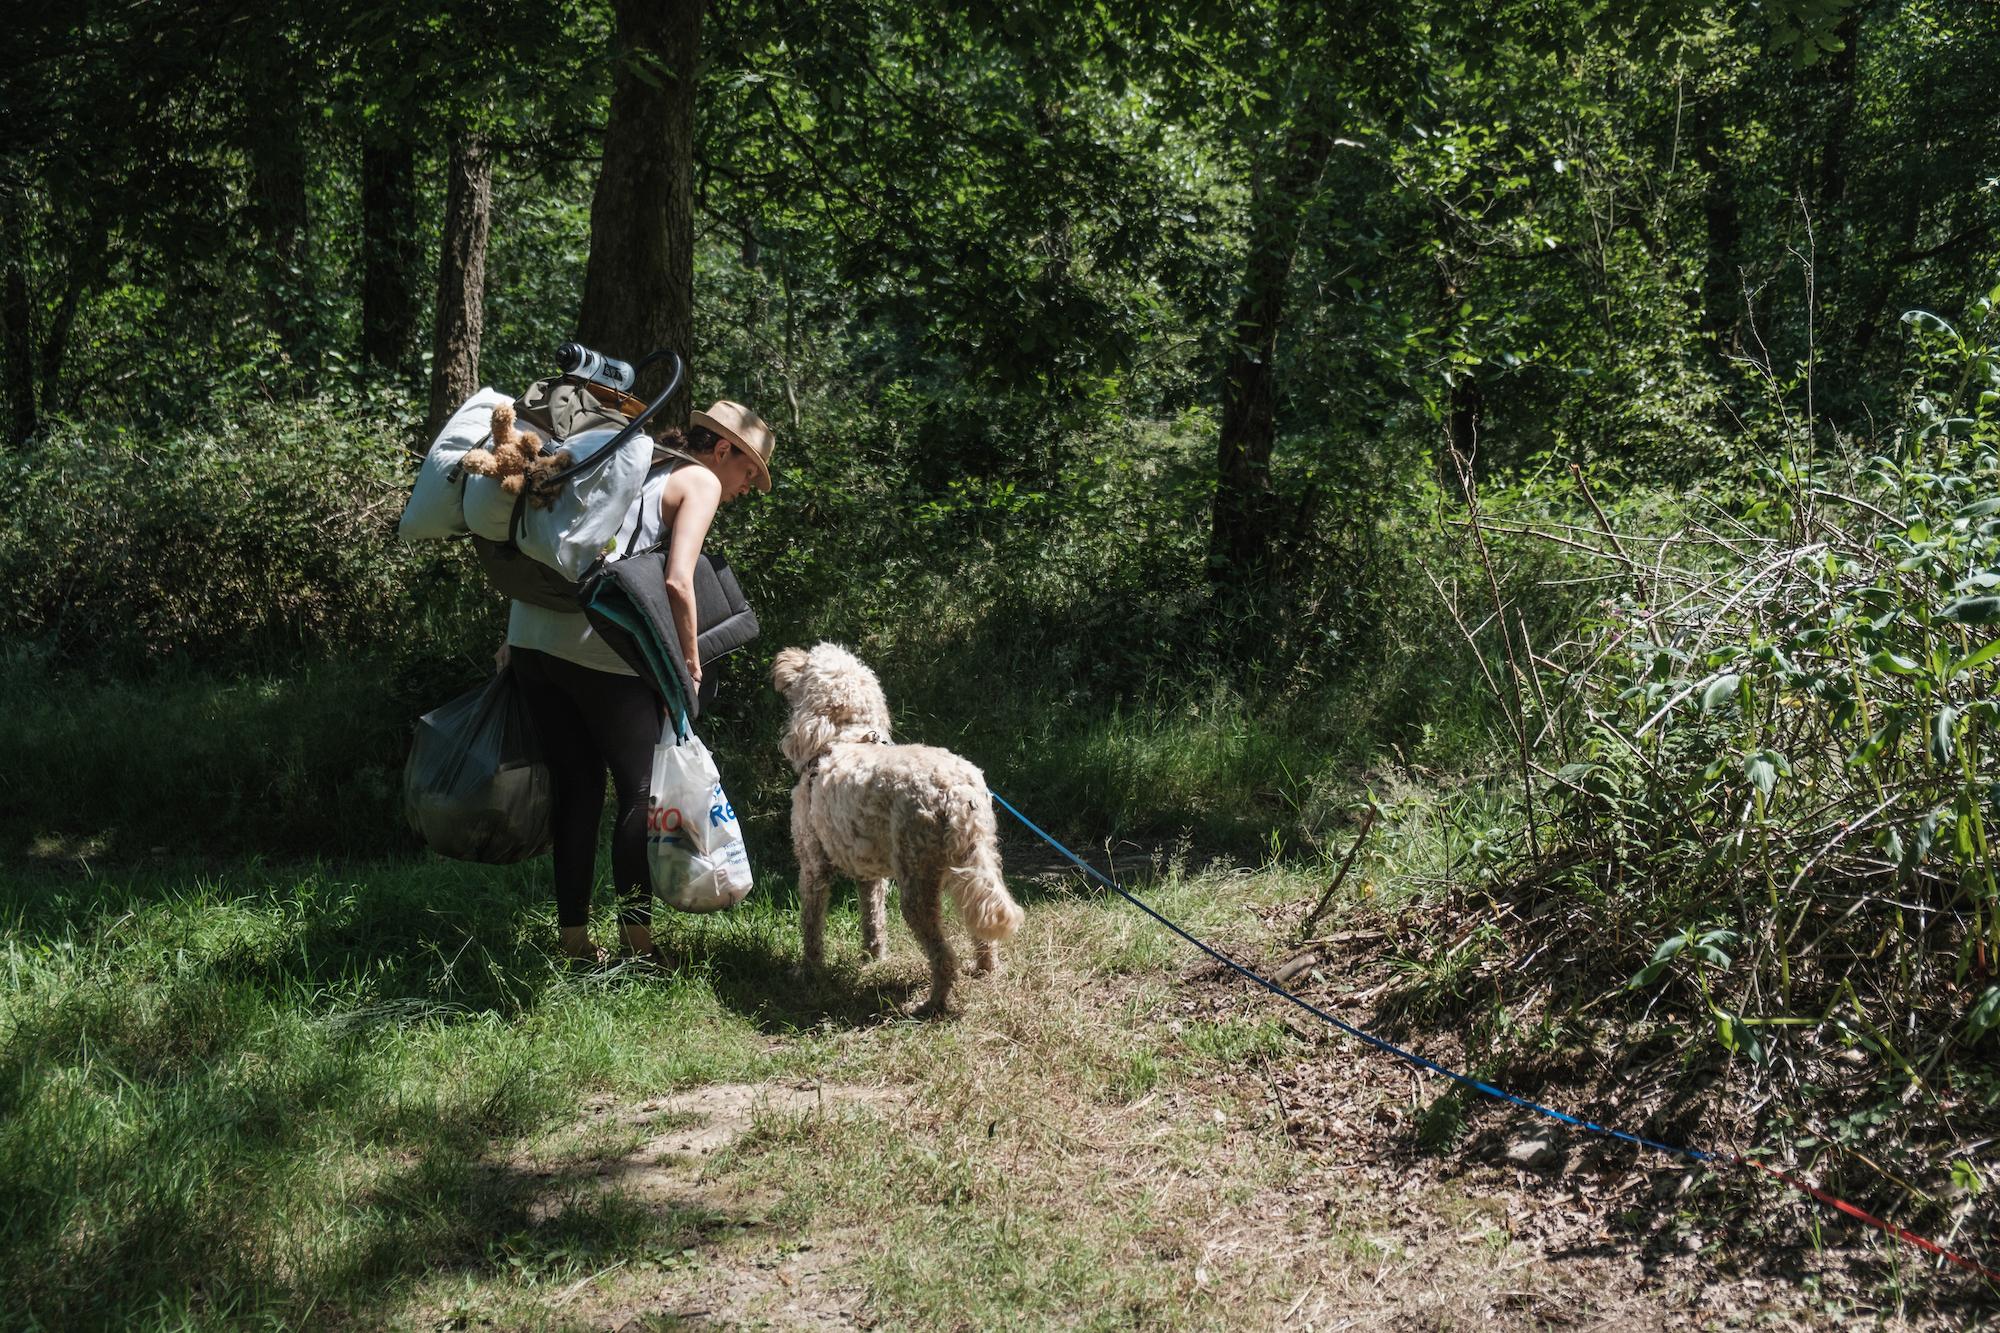 Wild Camping in Neath, Wales, UK - Ben Holbrook DriftwoodJournals.com-60